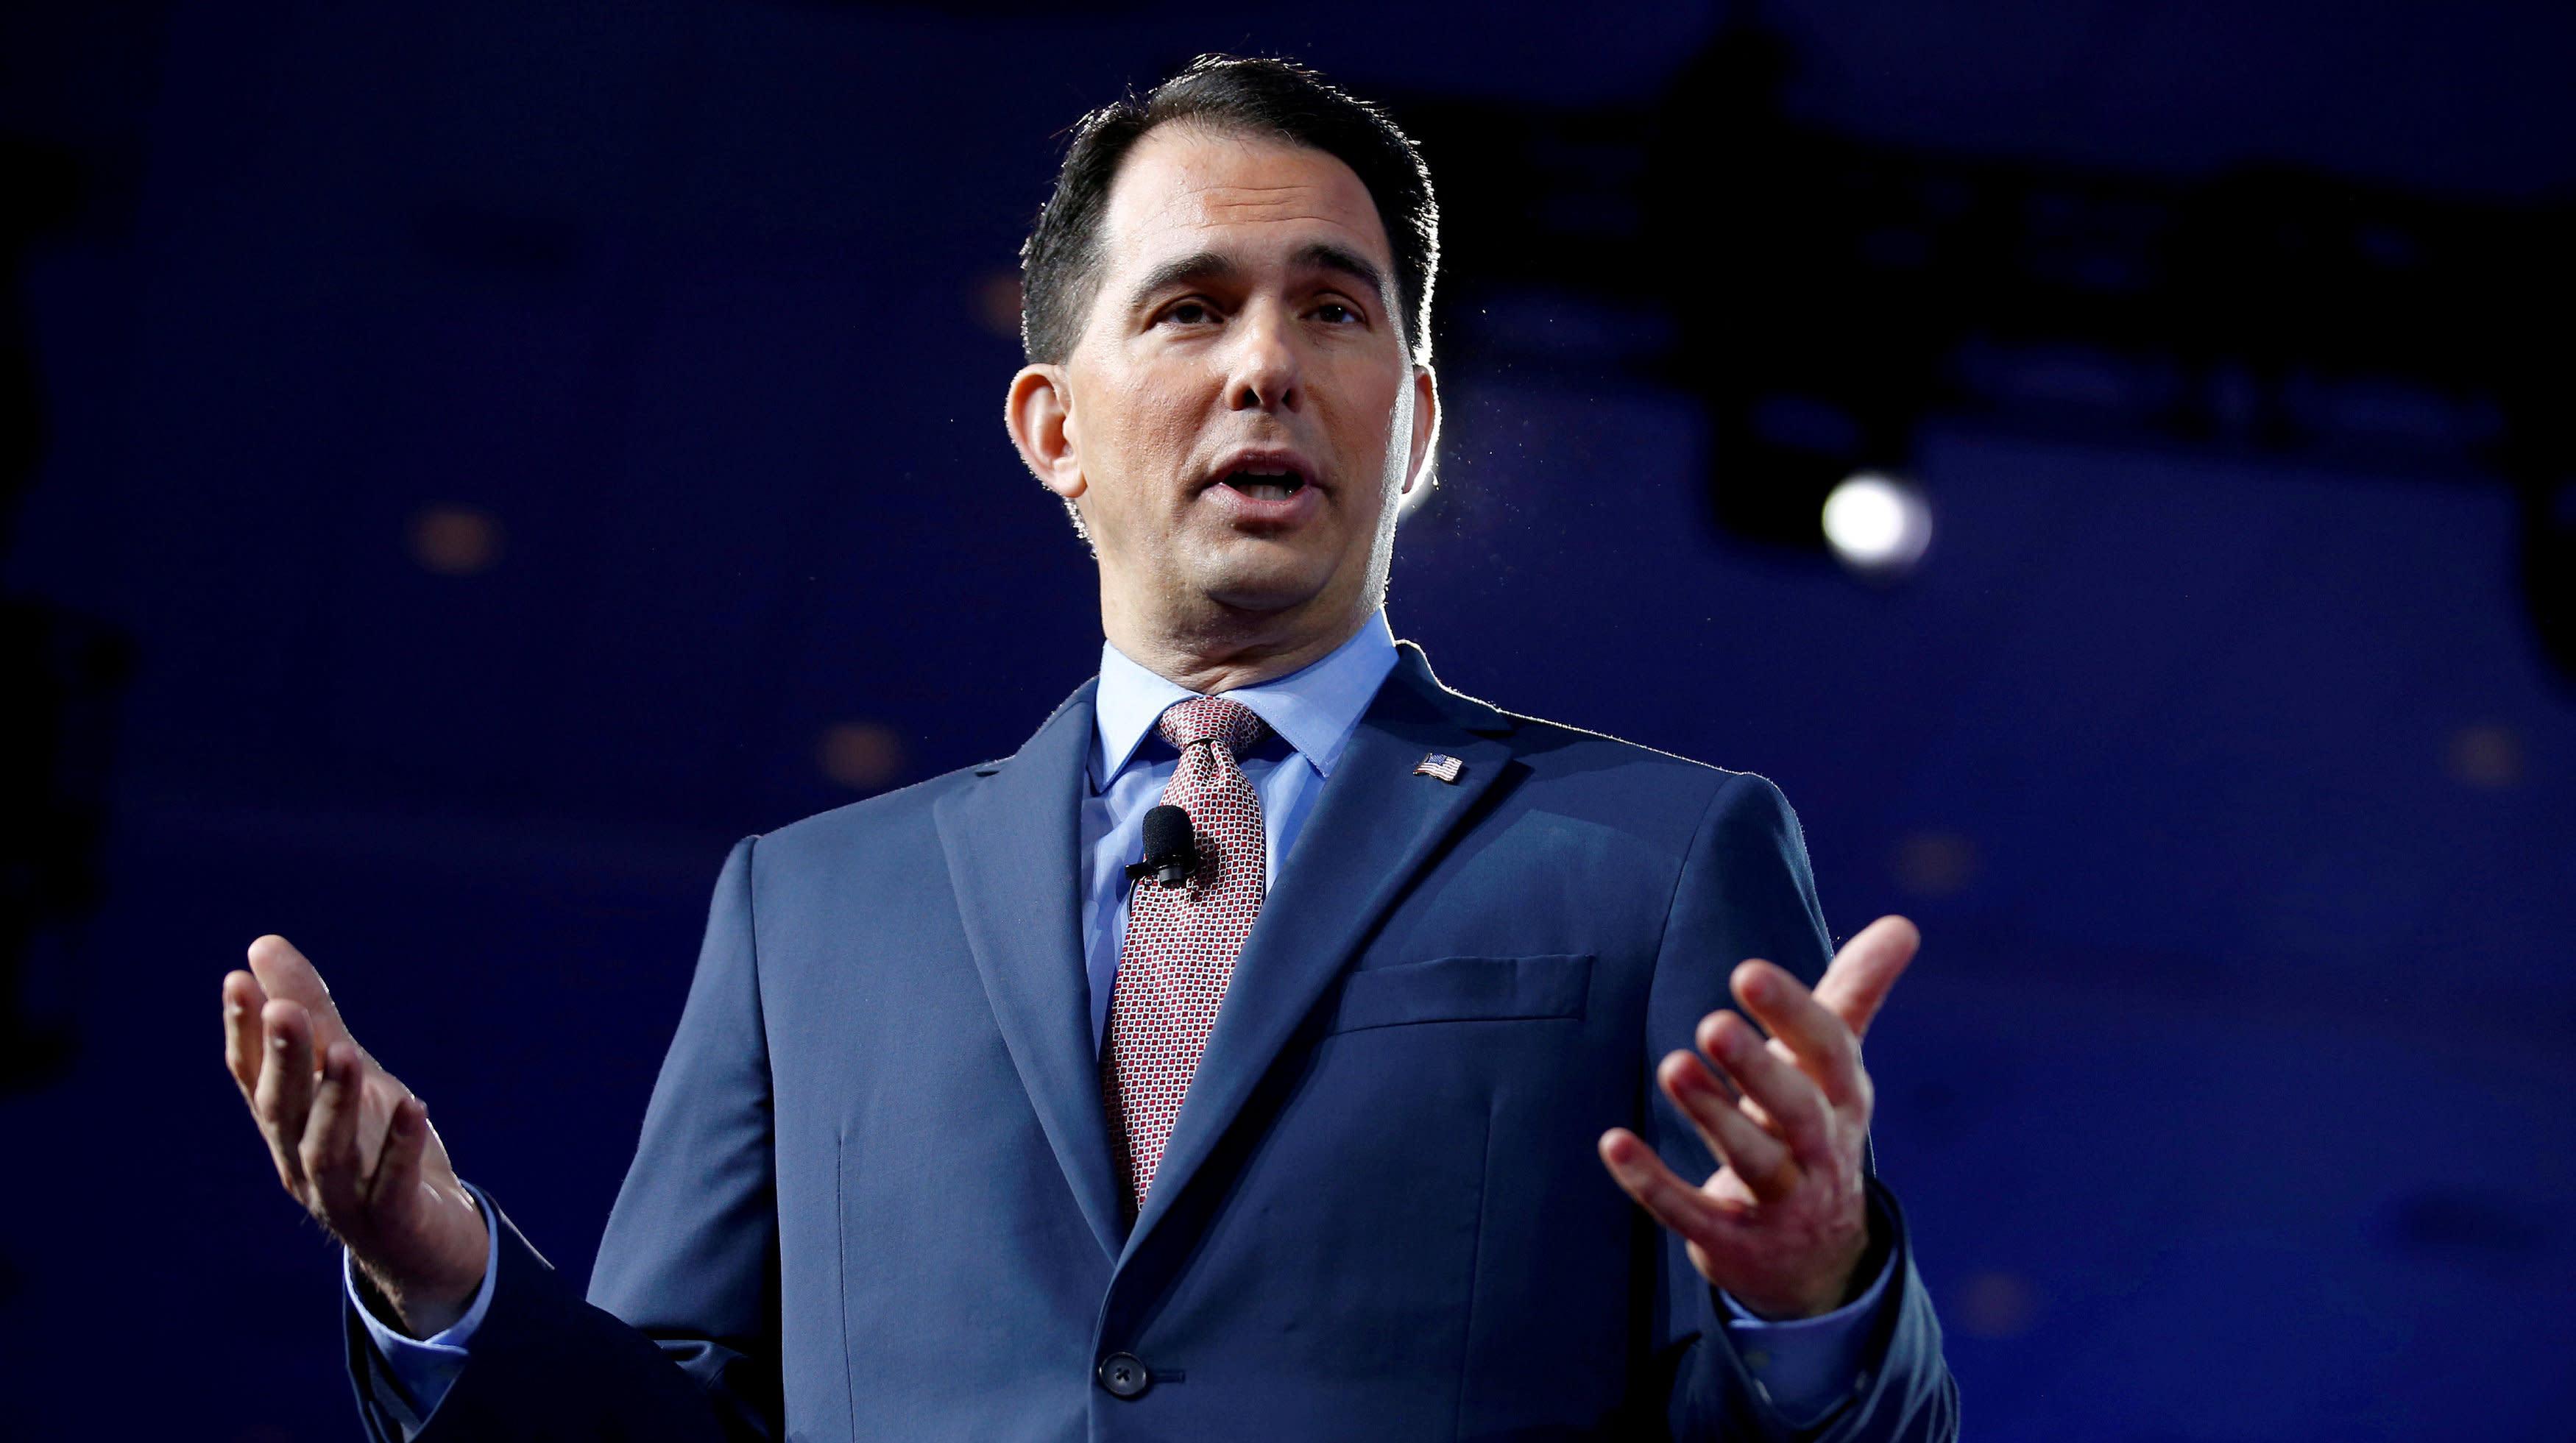 Wisconsin Democrats Finally Oust Republican Governor Scott Walker